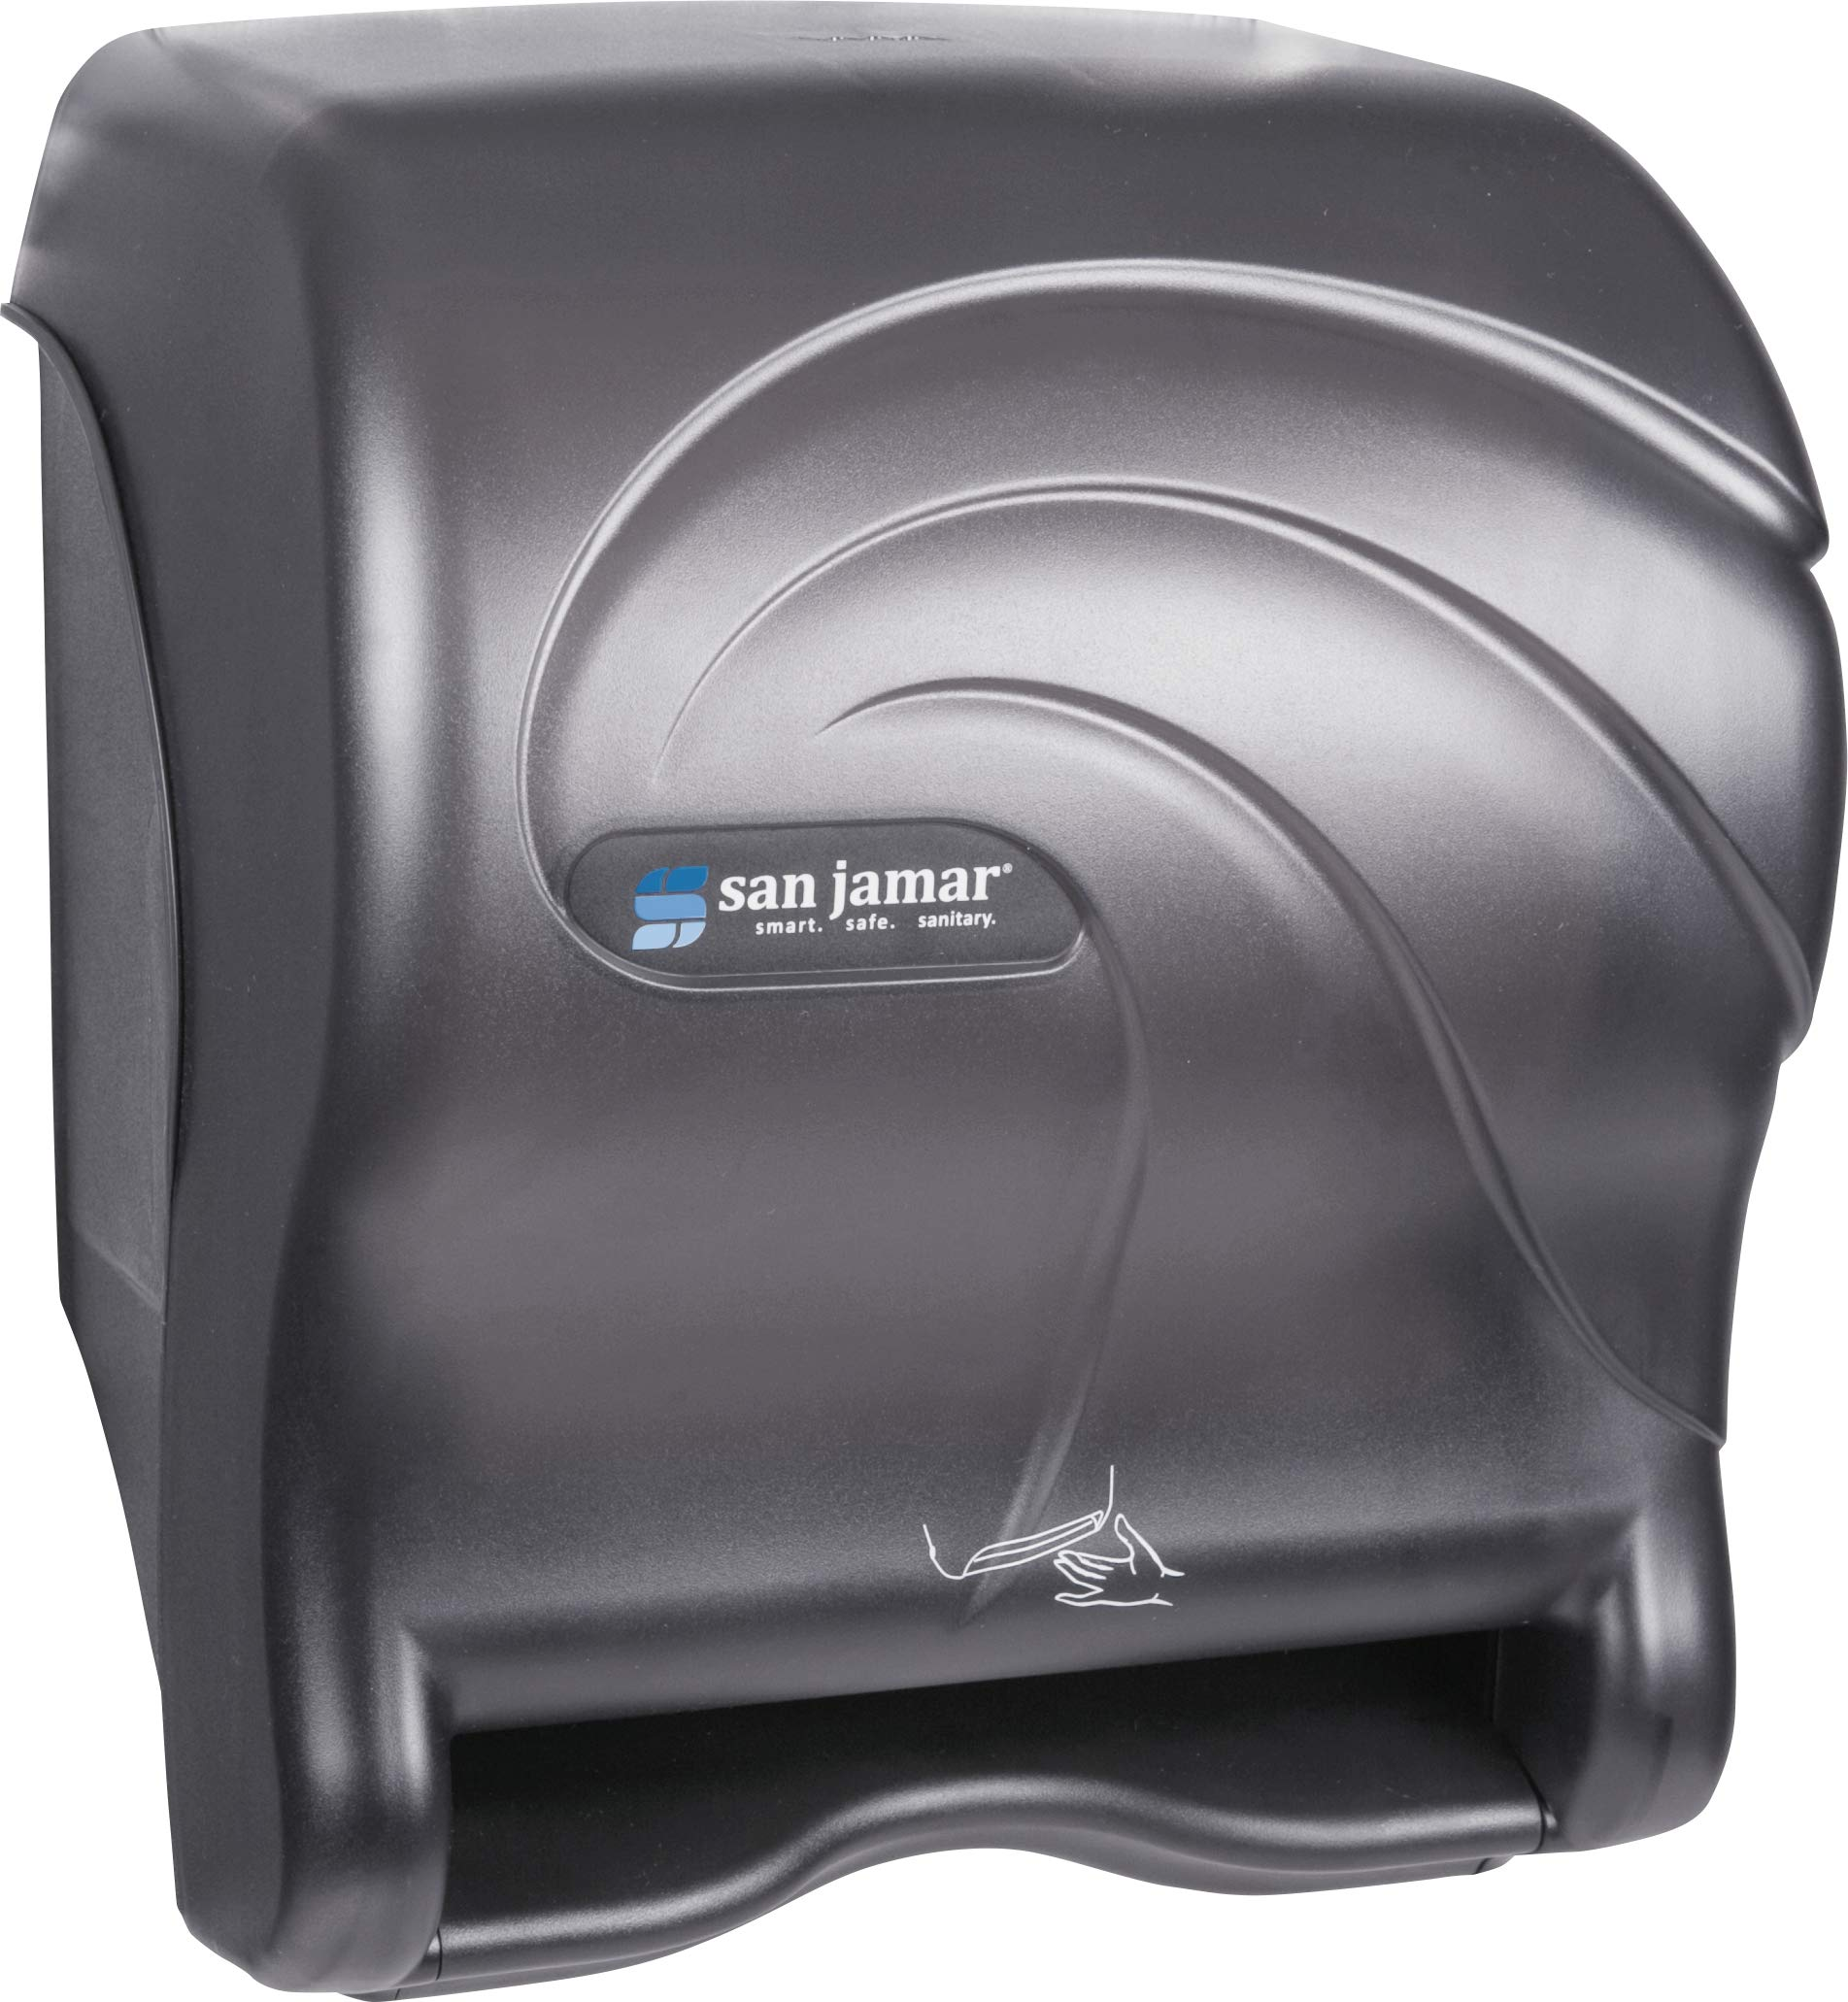 San Jamar T8490TBK Smart Essence Oceans Hands Free Paper Towel Dispenser, Black Pearl by San Jamar (Image #3)